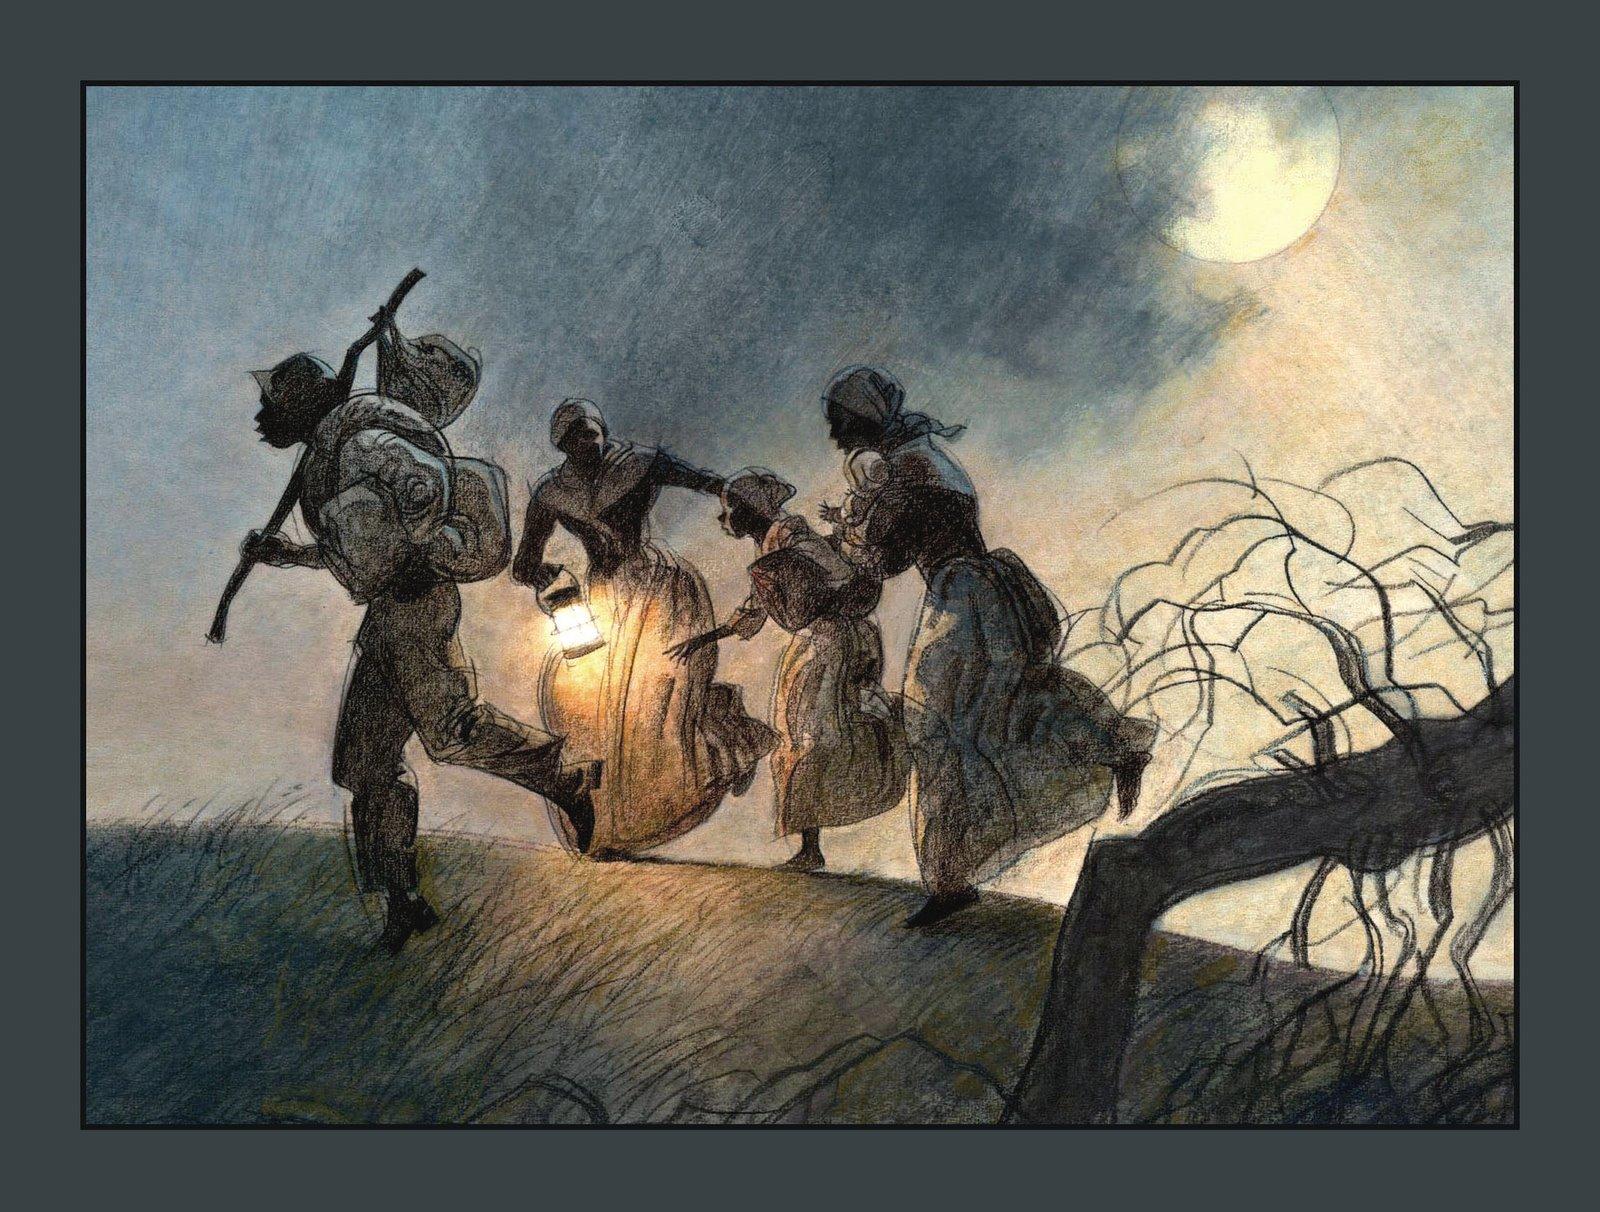 A Gastronomic Tour Through Black History Bhm The Underground Railroad Escape To Freedom